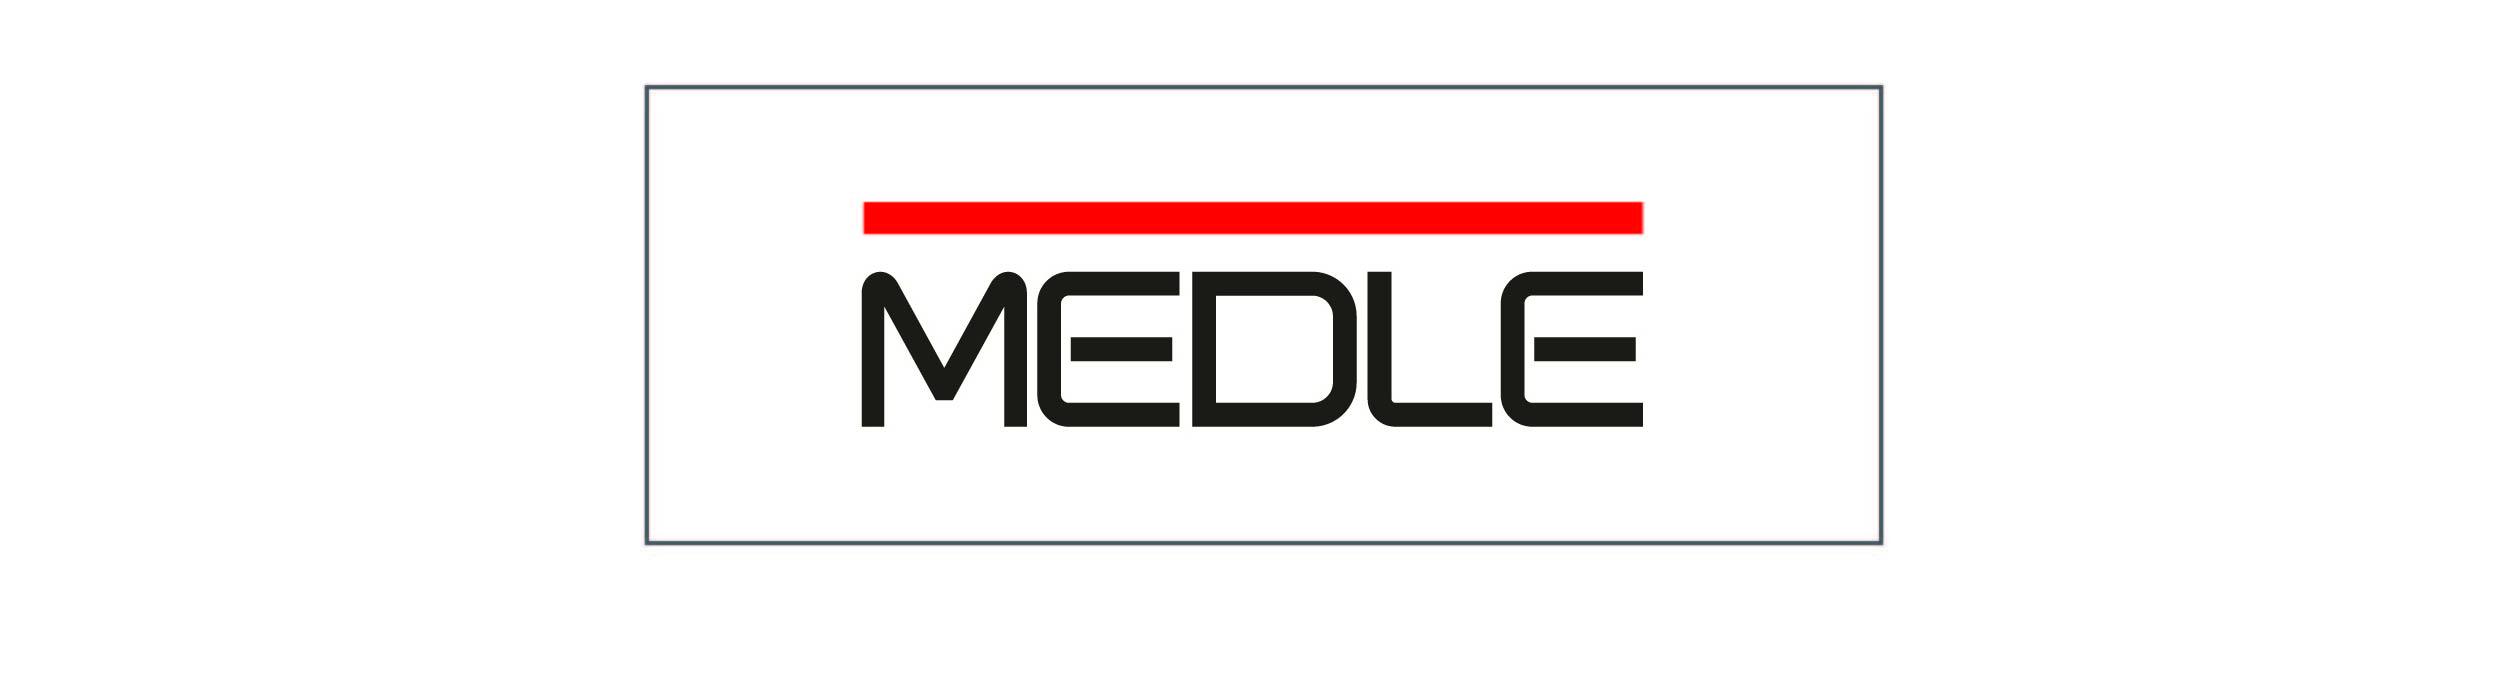 1medle-01